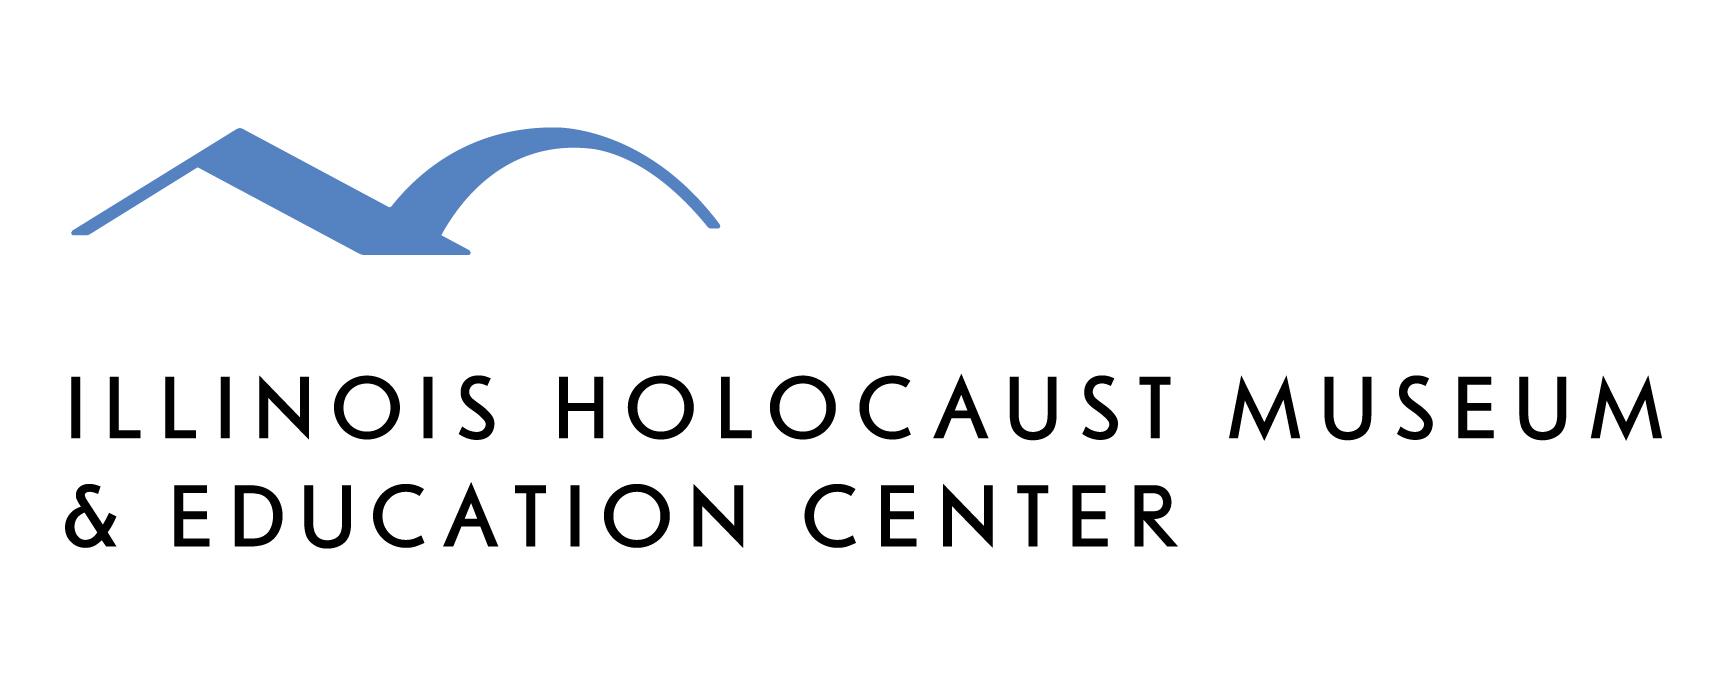 Illinois Holocaust Museum & Education Center Logo.JPG